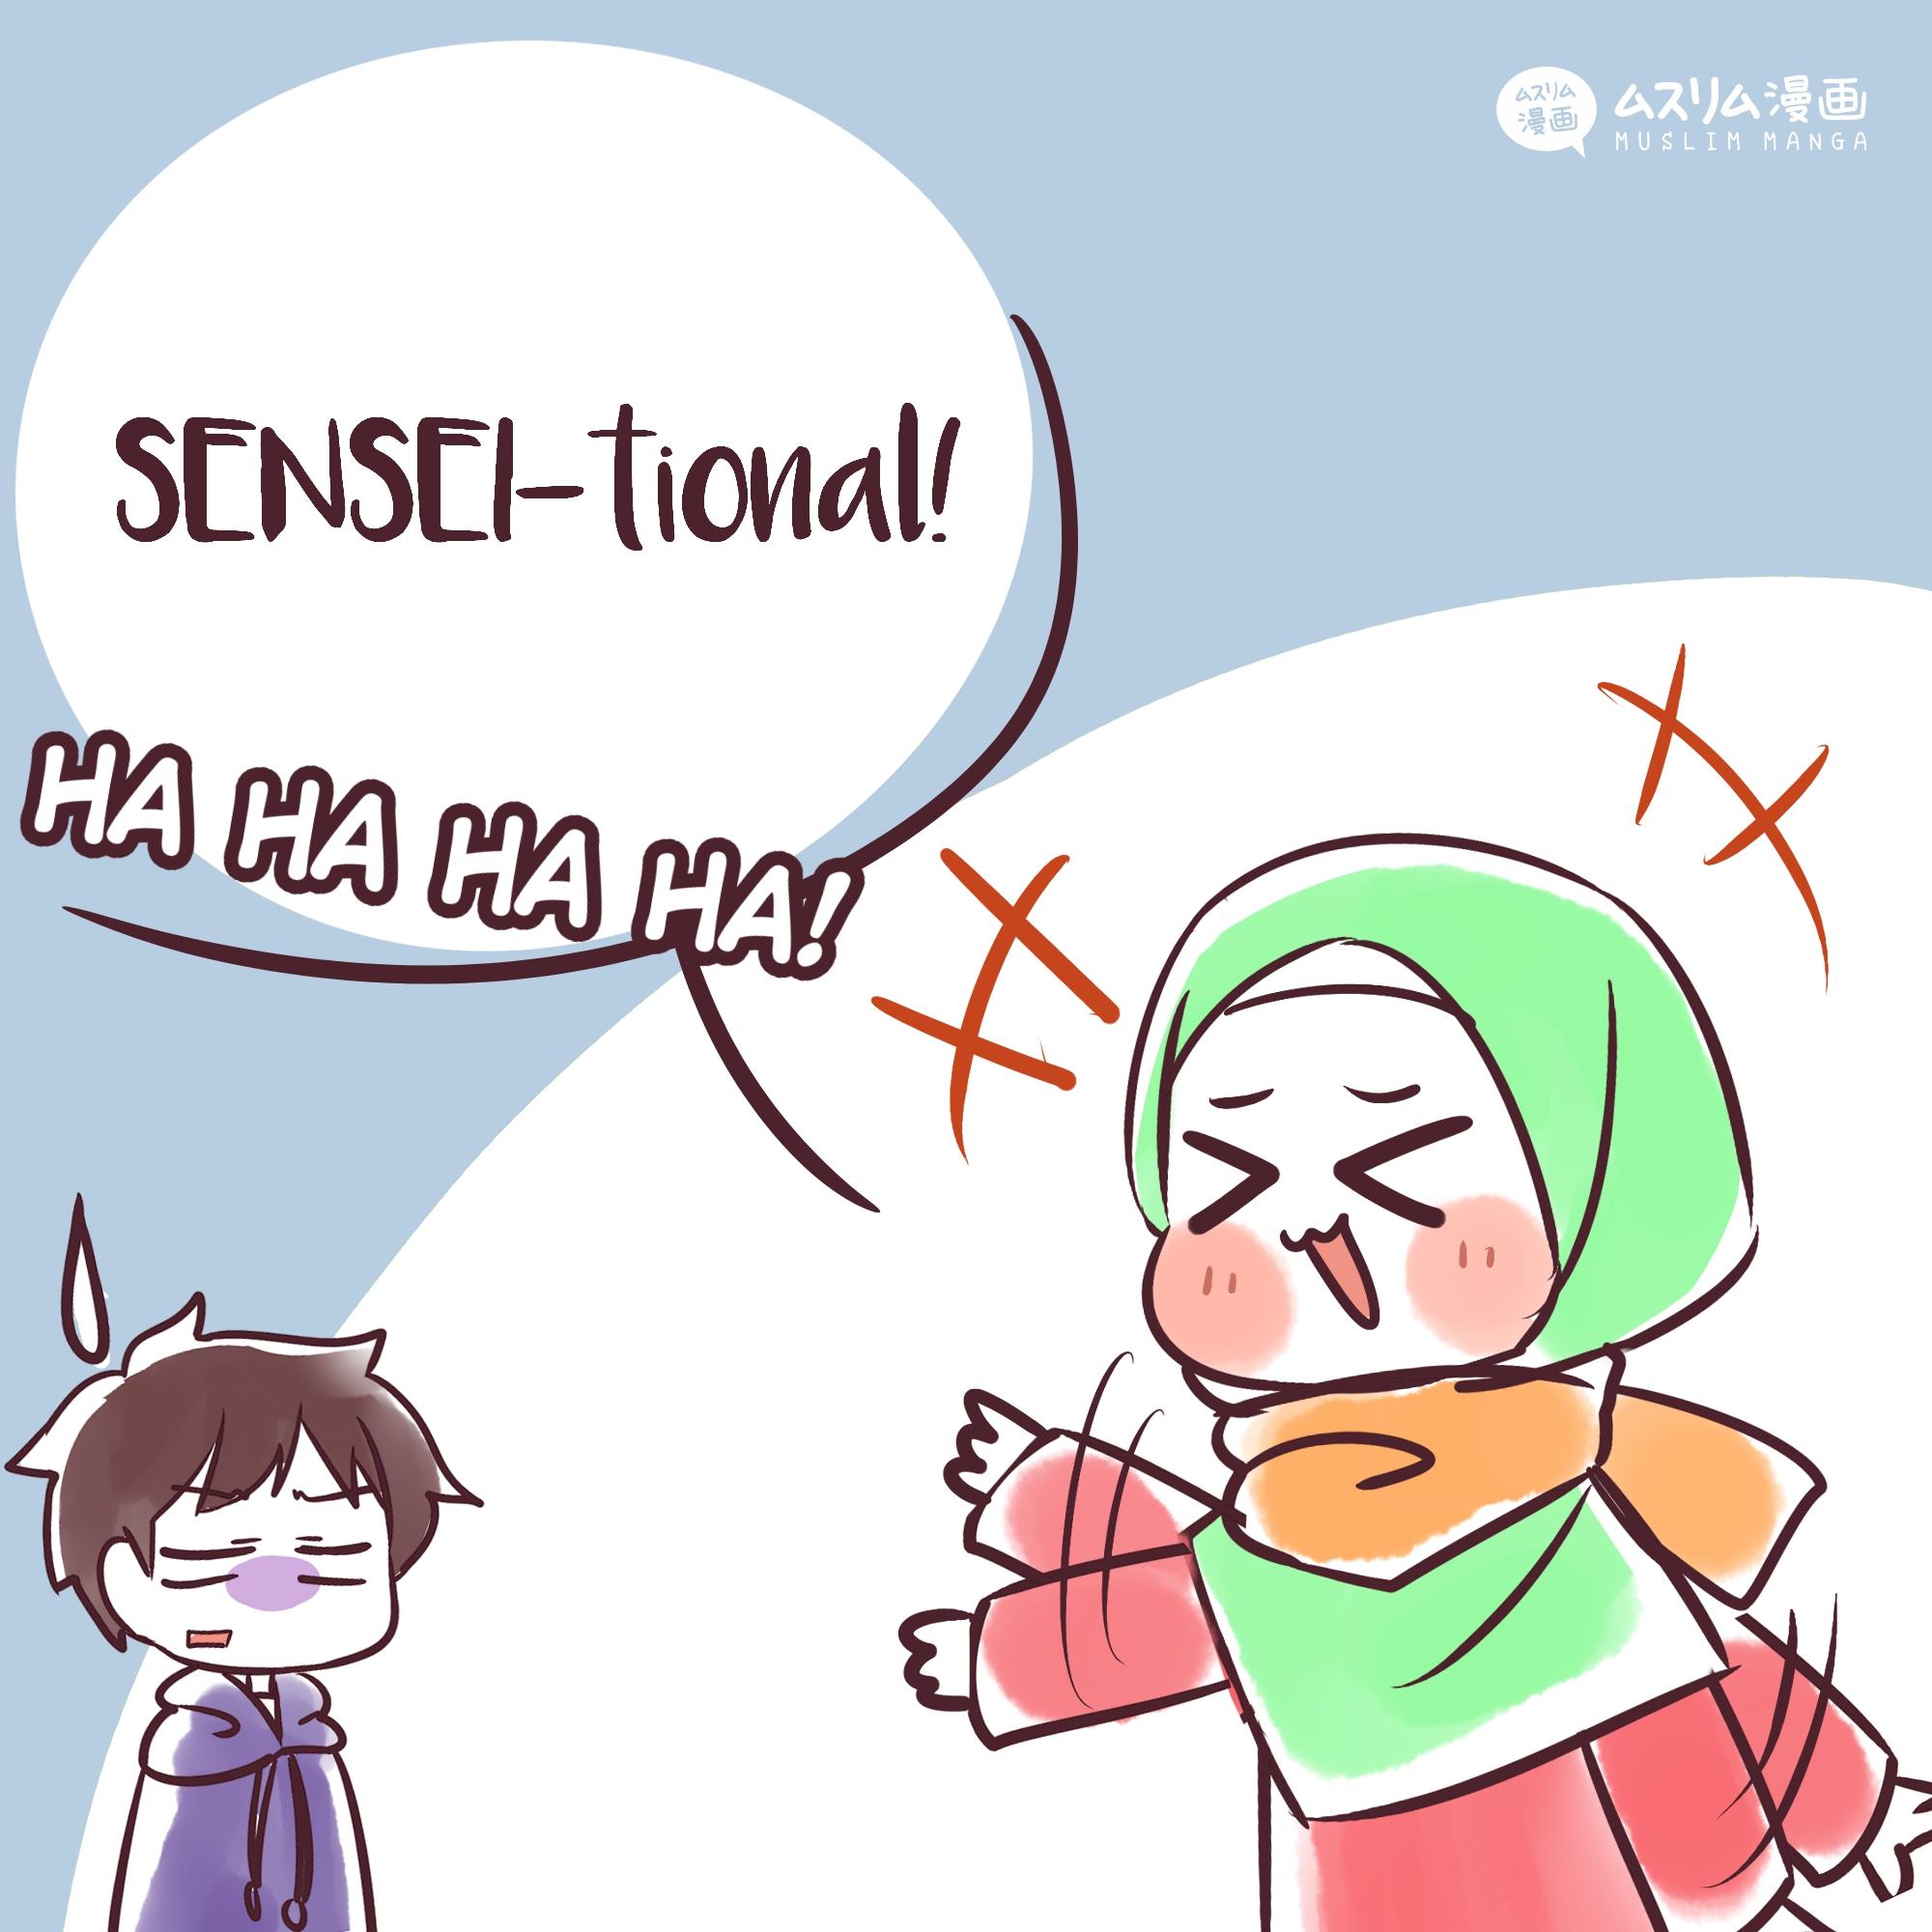 fun puns: sensei 2